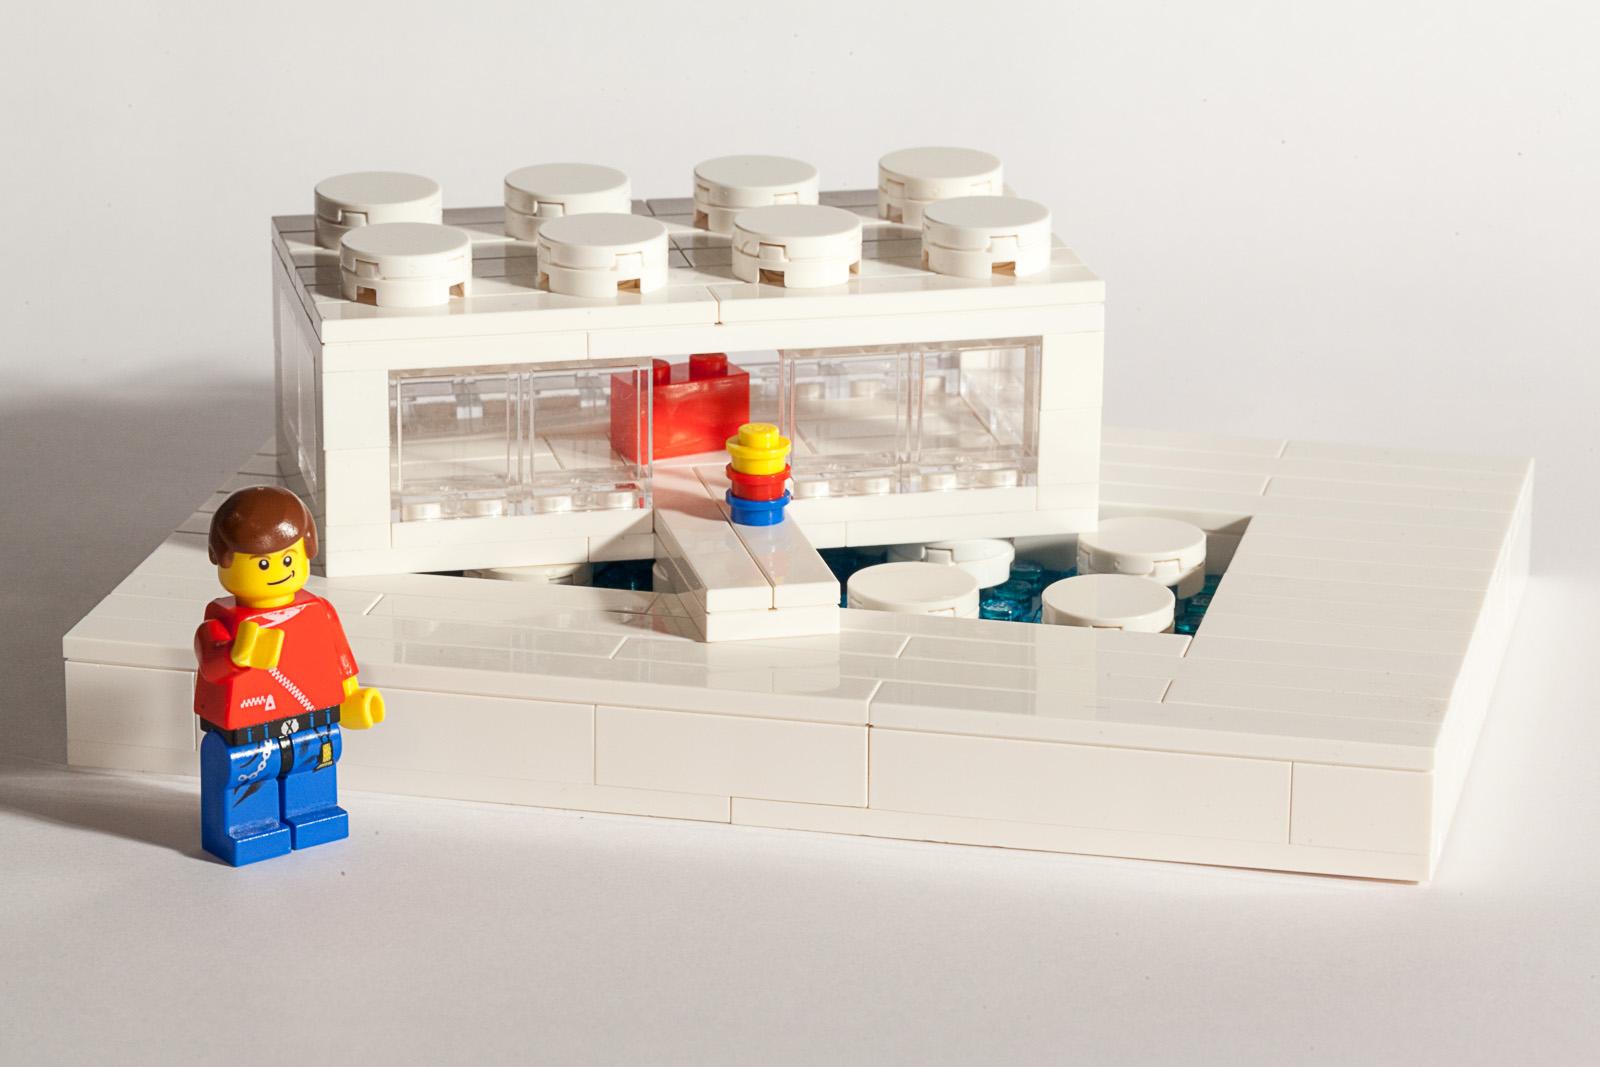 Lego Architecture Studio 30-day challenge - Tom Alphin